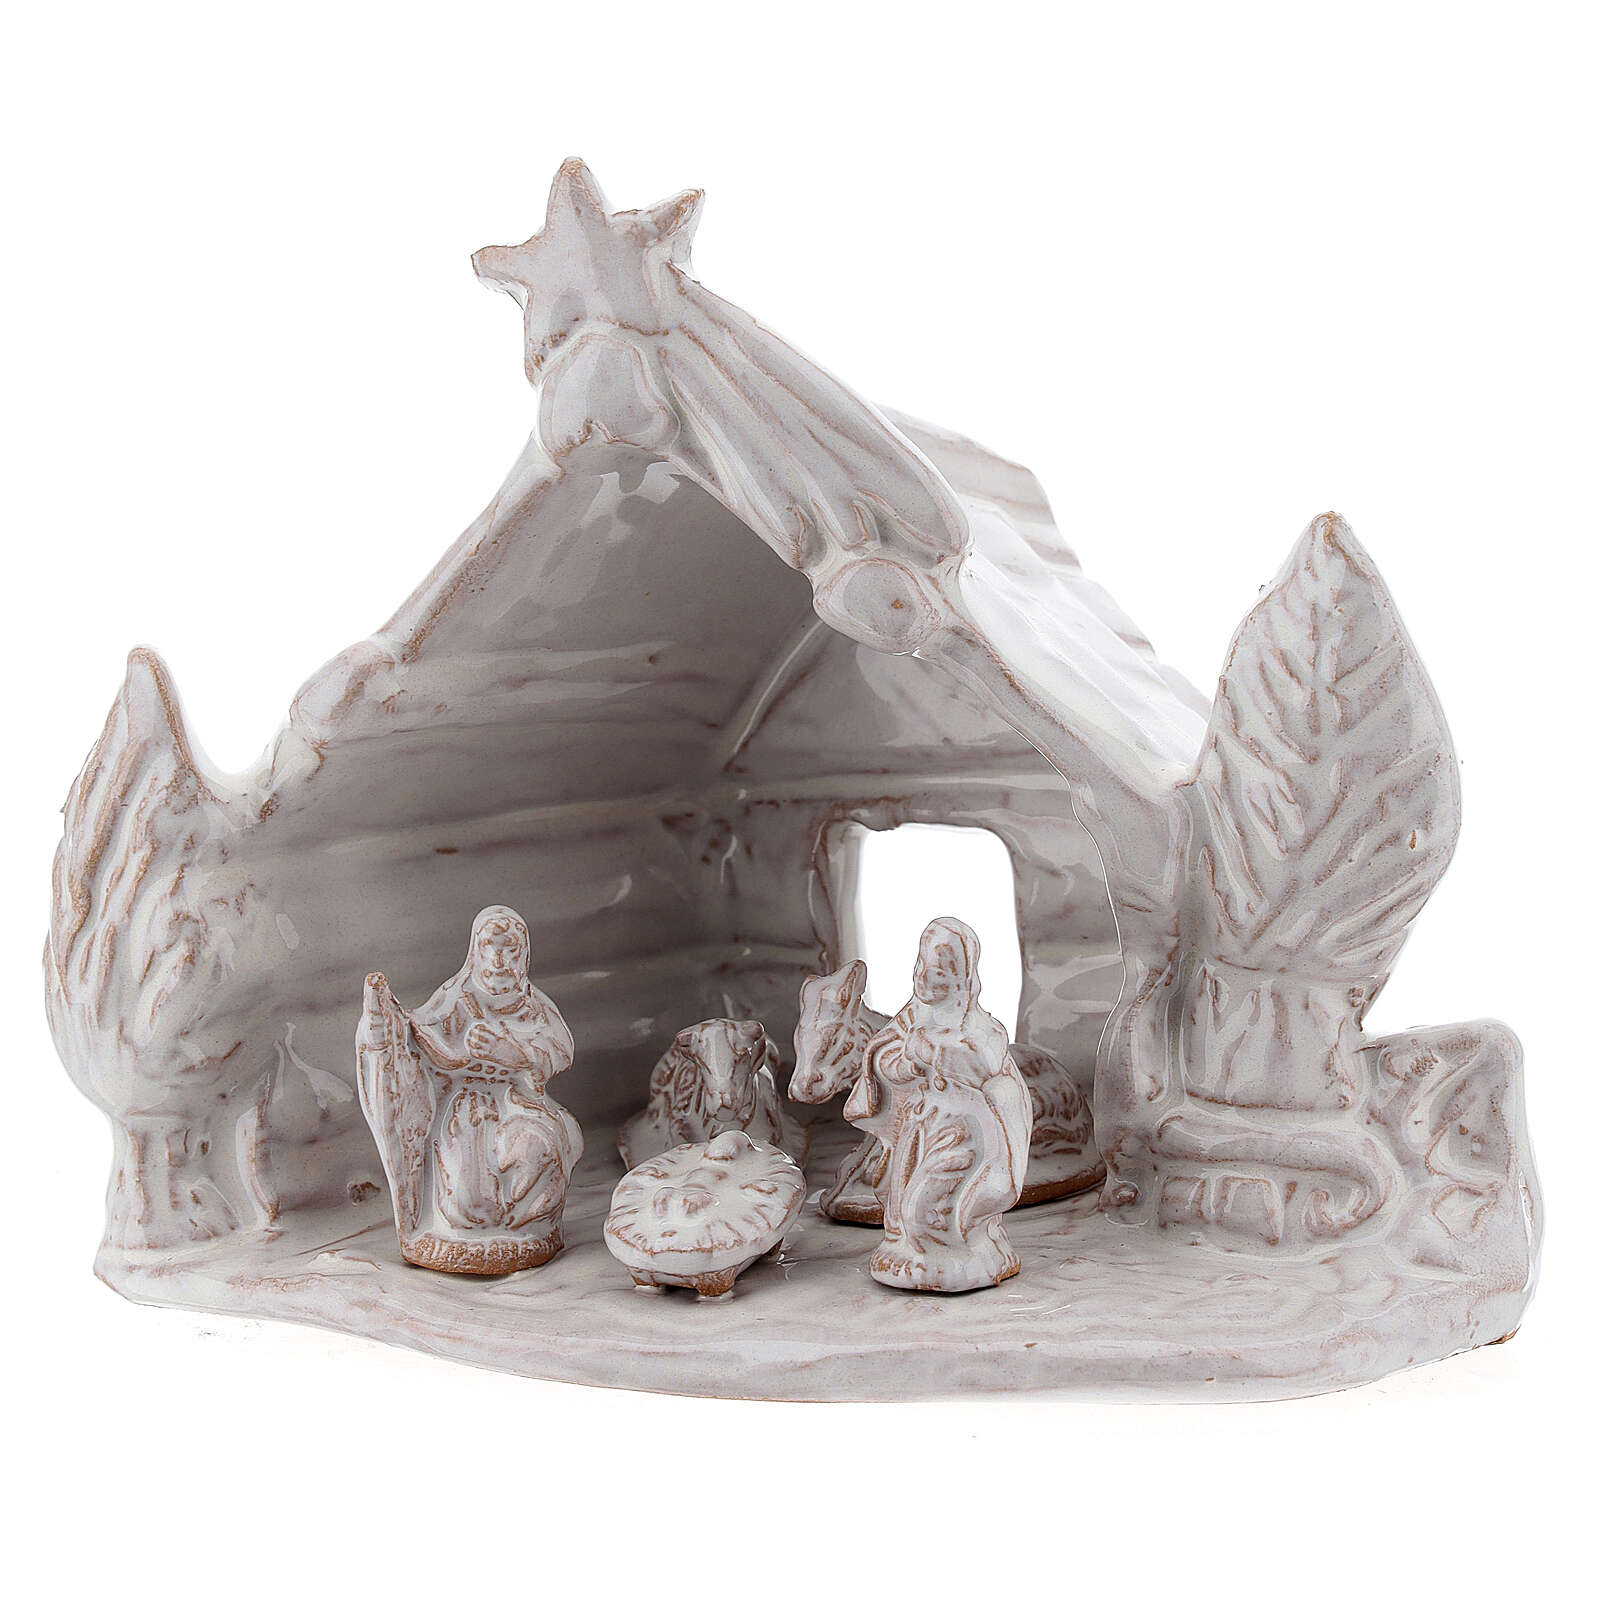 Cabaña de troncos belén Natividad terracota blanca Deruta 10 cm 4